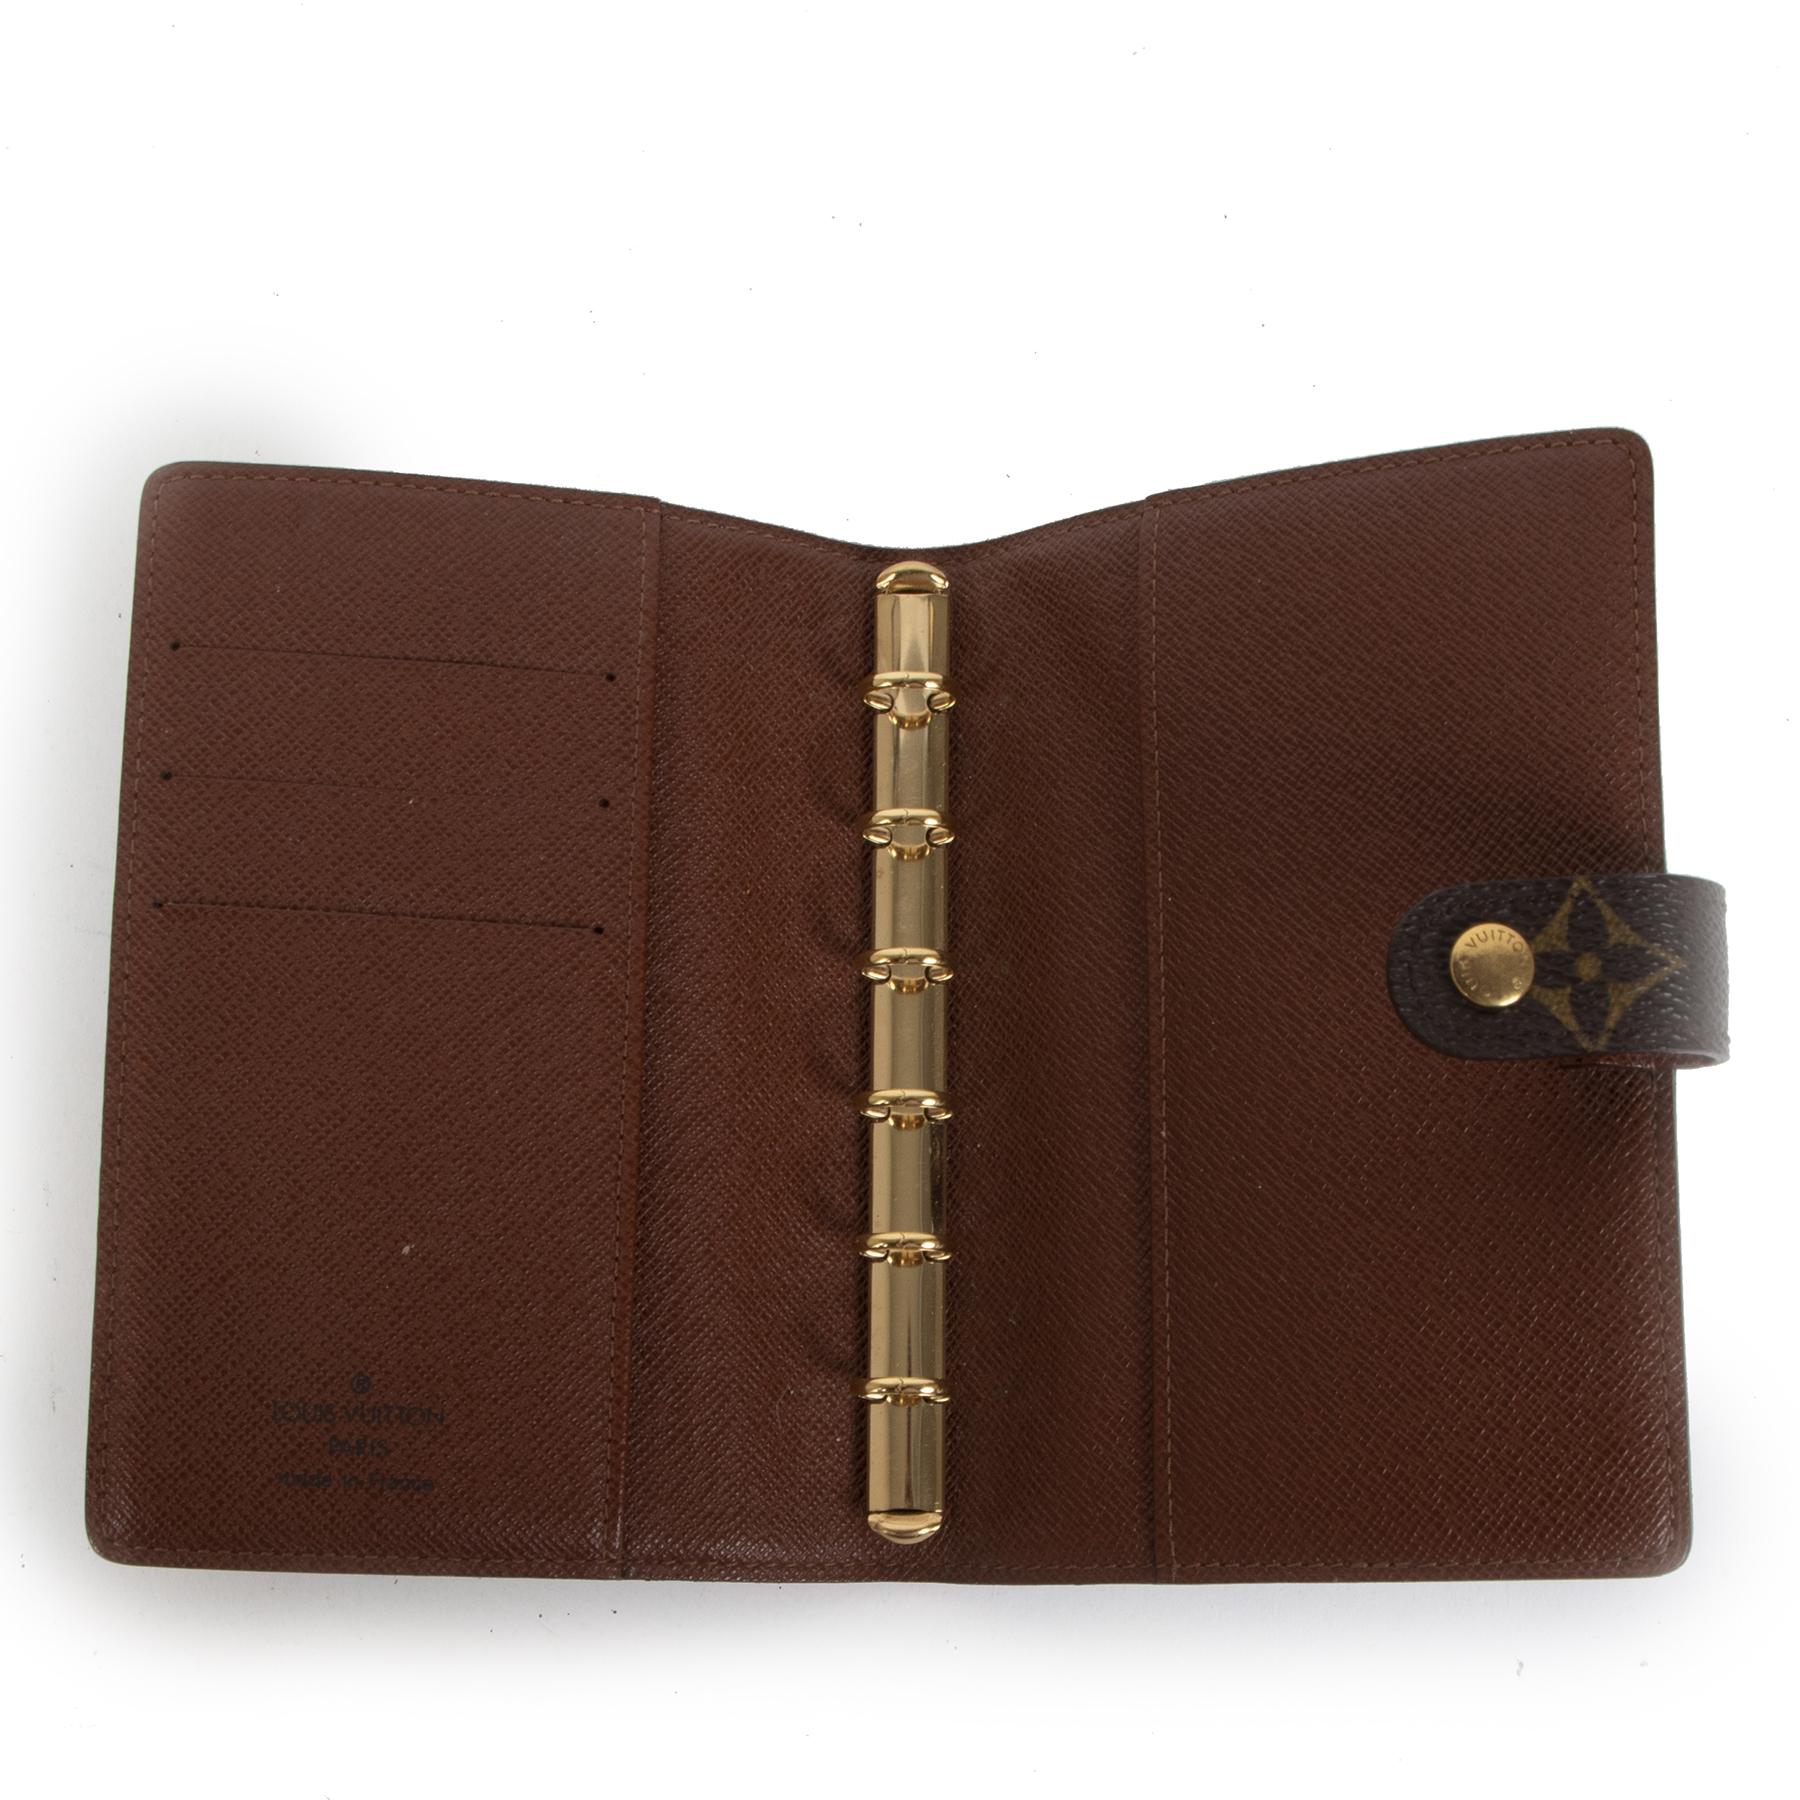 Authentieke tweedehands vintage Louis Vuitton Small Ring Agenda Cover koop online webshop LabelLOV